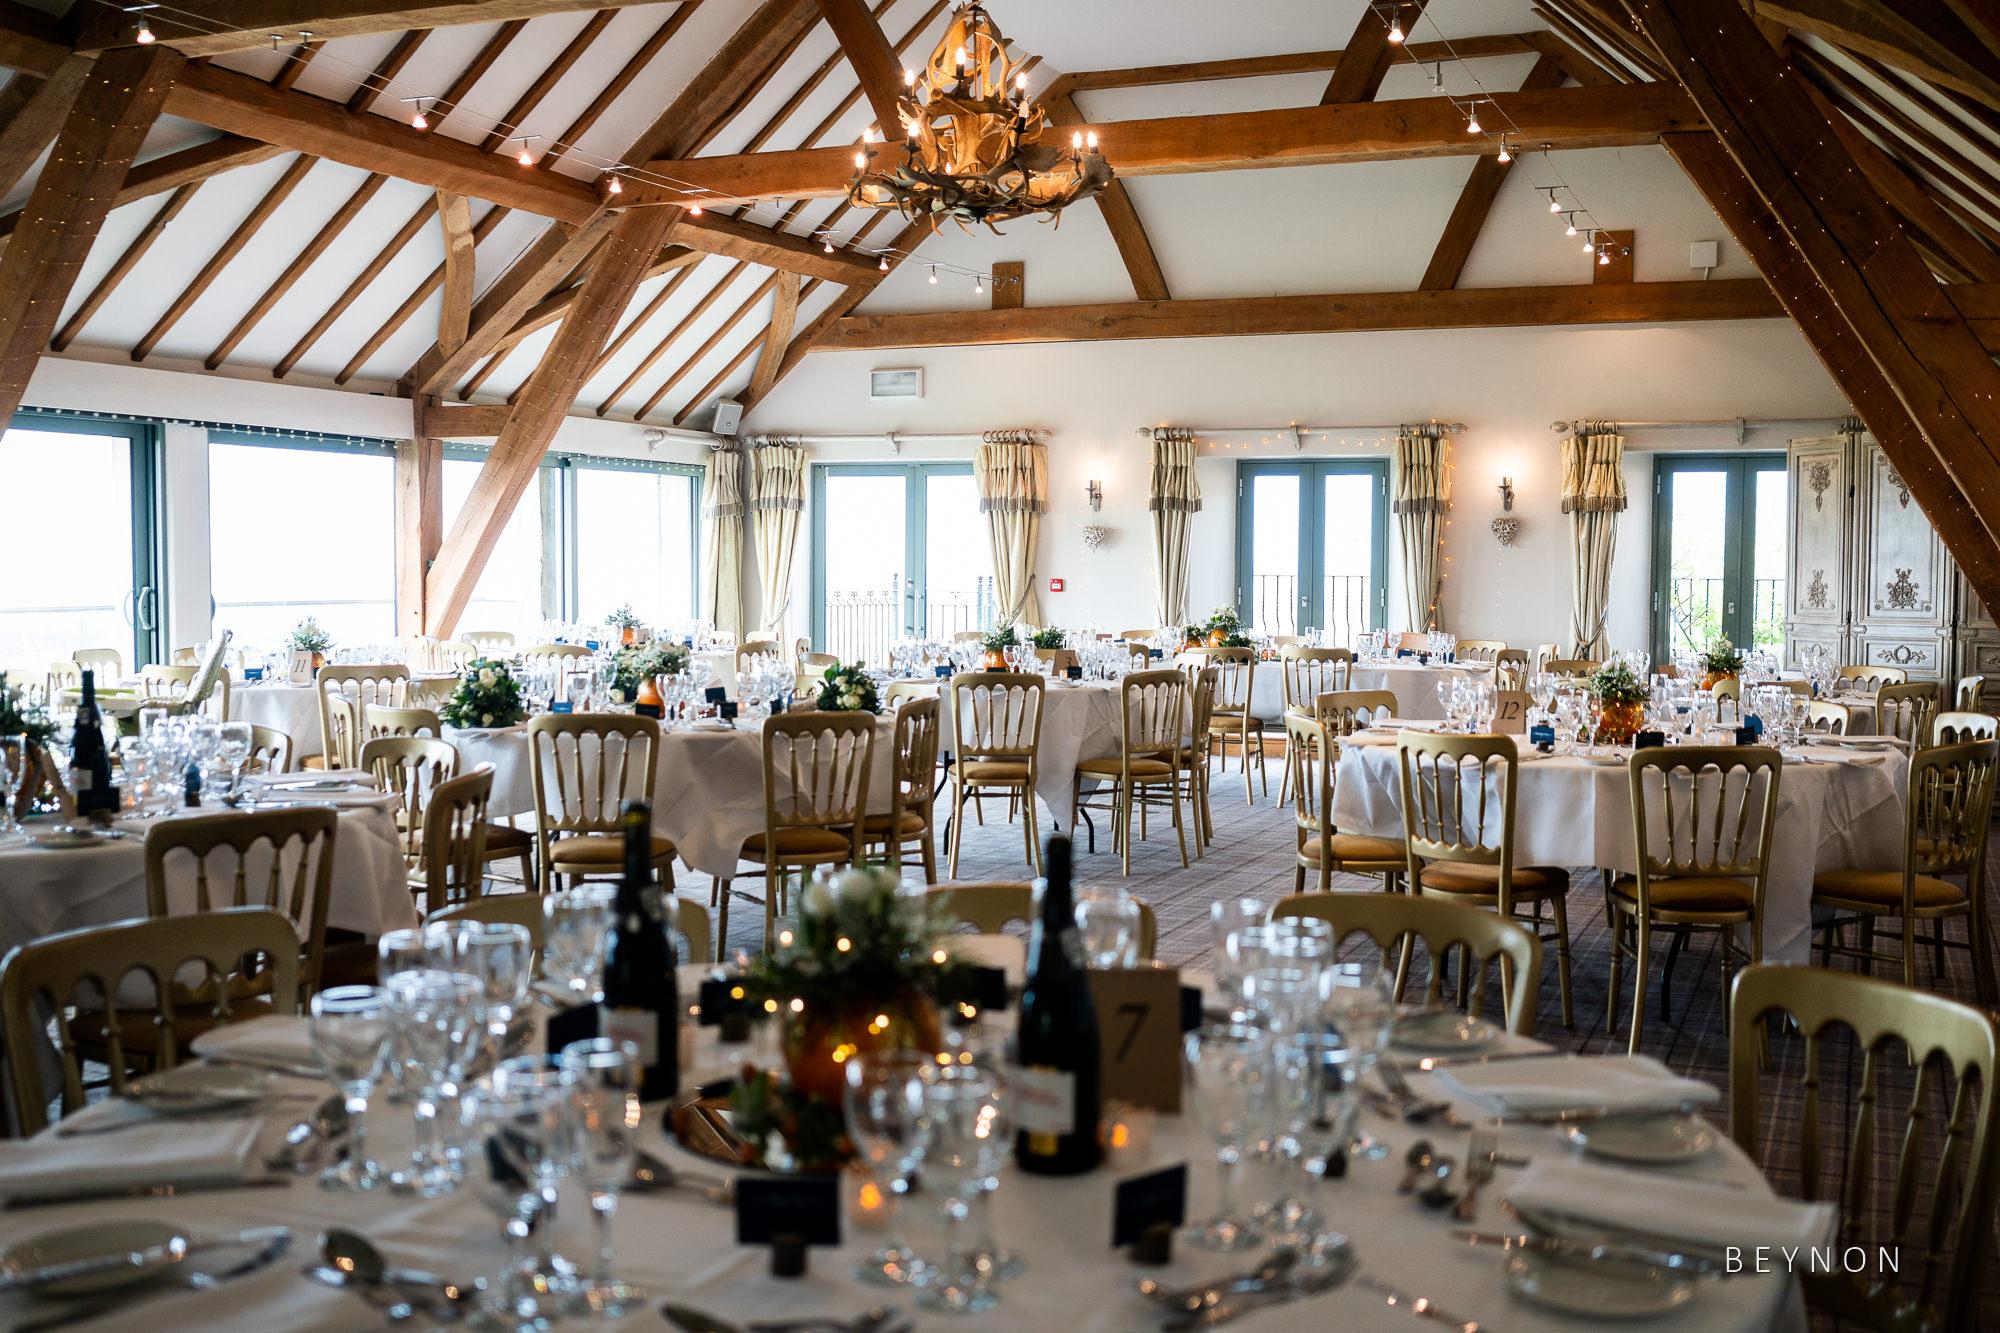 The wedding breakfast room